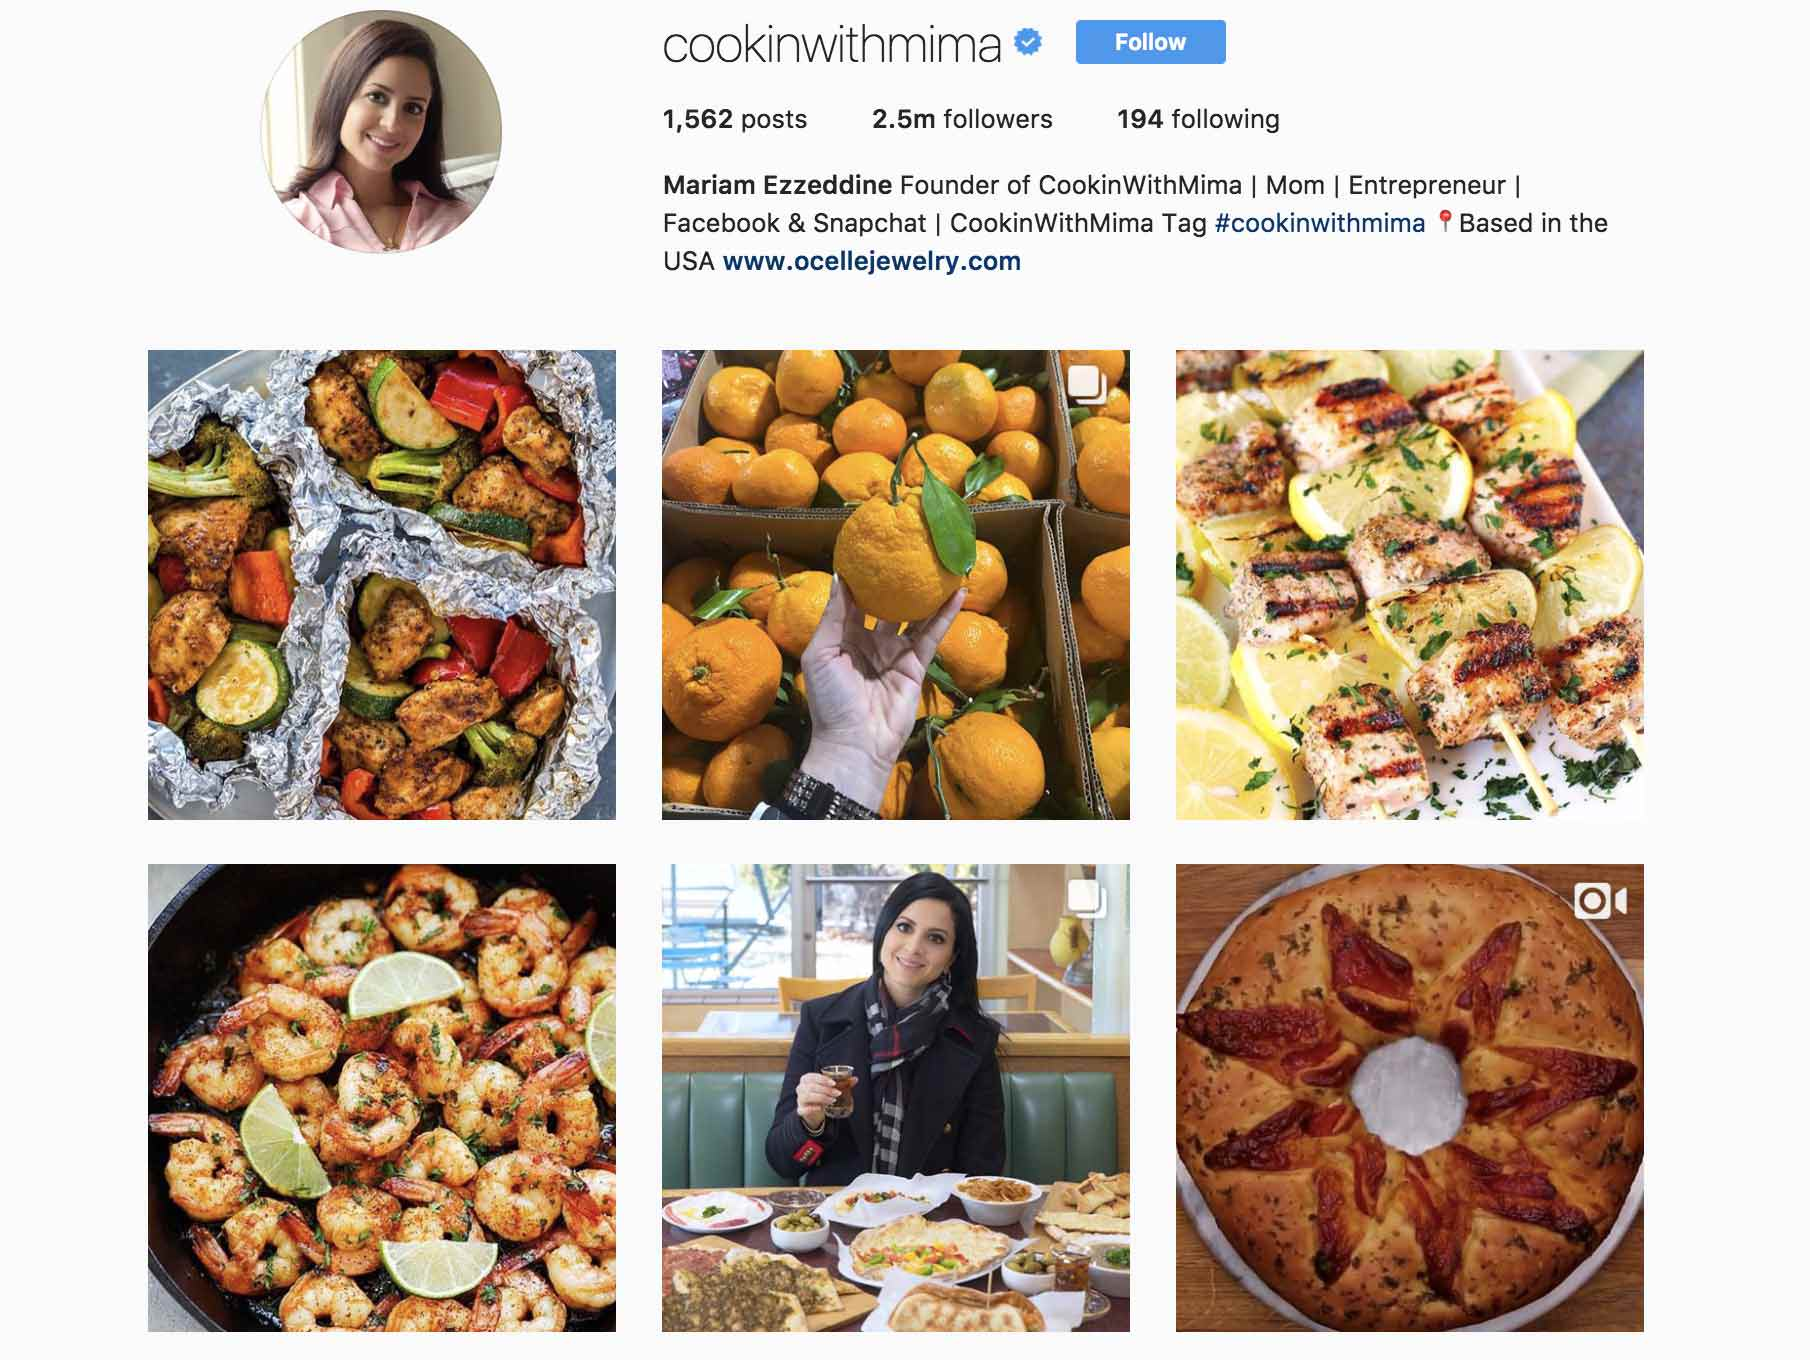 cookin-with-mima-best-brands-on-instagram